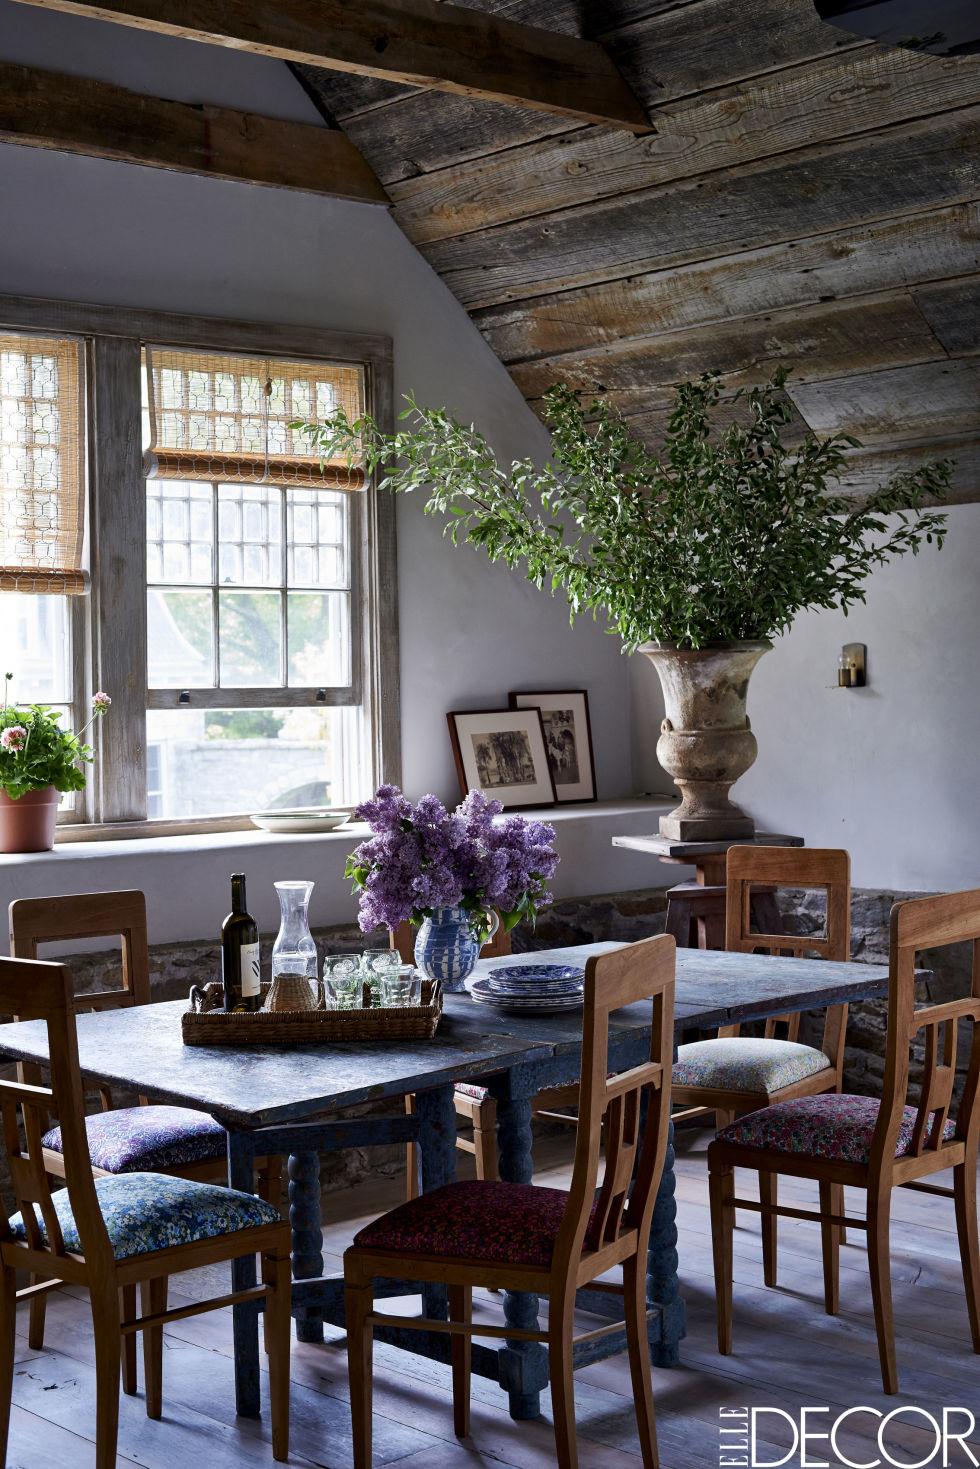 Virginia_Tupker_Mikkel_Vang_Bedfor_New_York_Carriage_House_Louise_Dockery_Paper_and_Moon_dining_table_rustic_blue.jpg